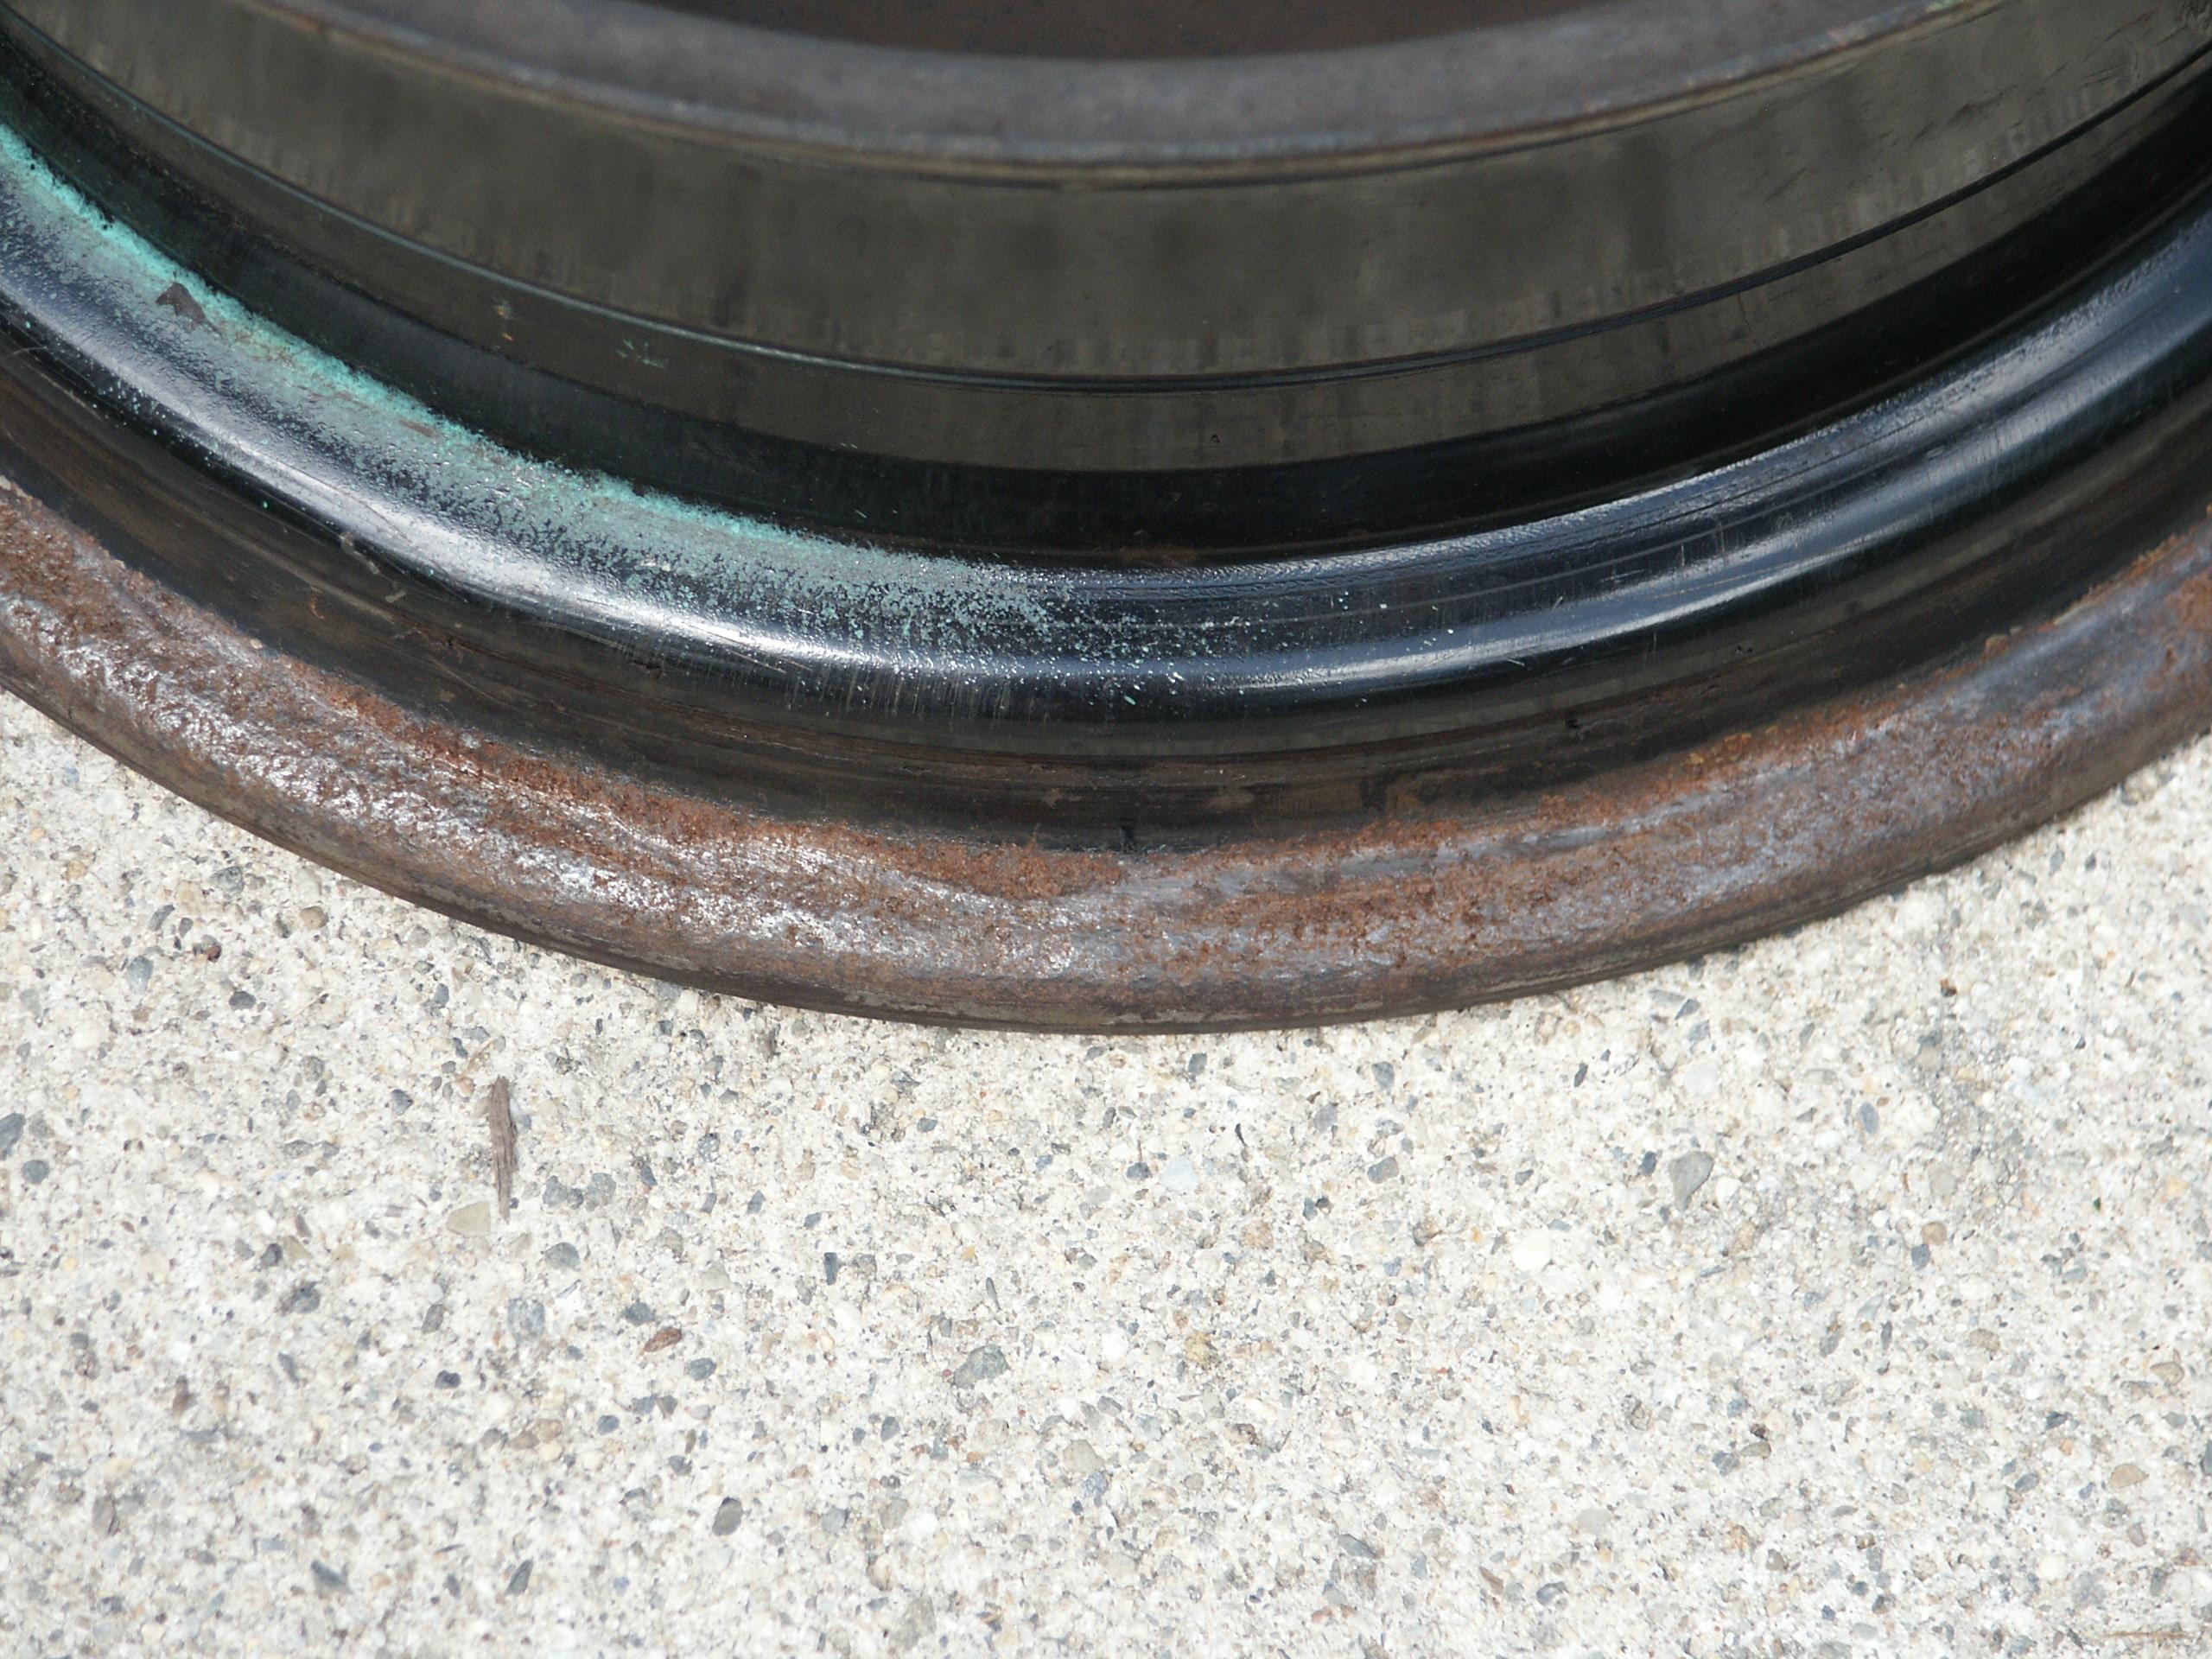 Tire Bead Rim Flange Air Leaks Explained